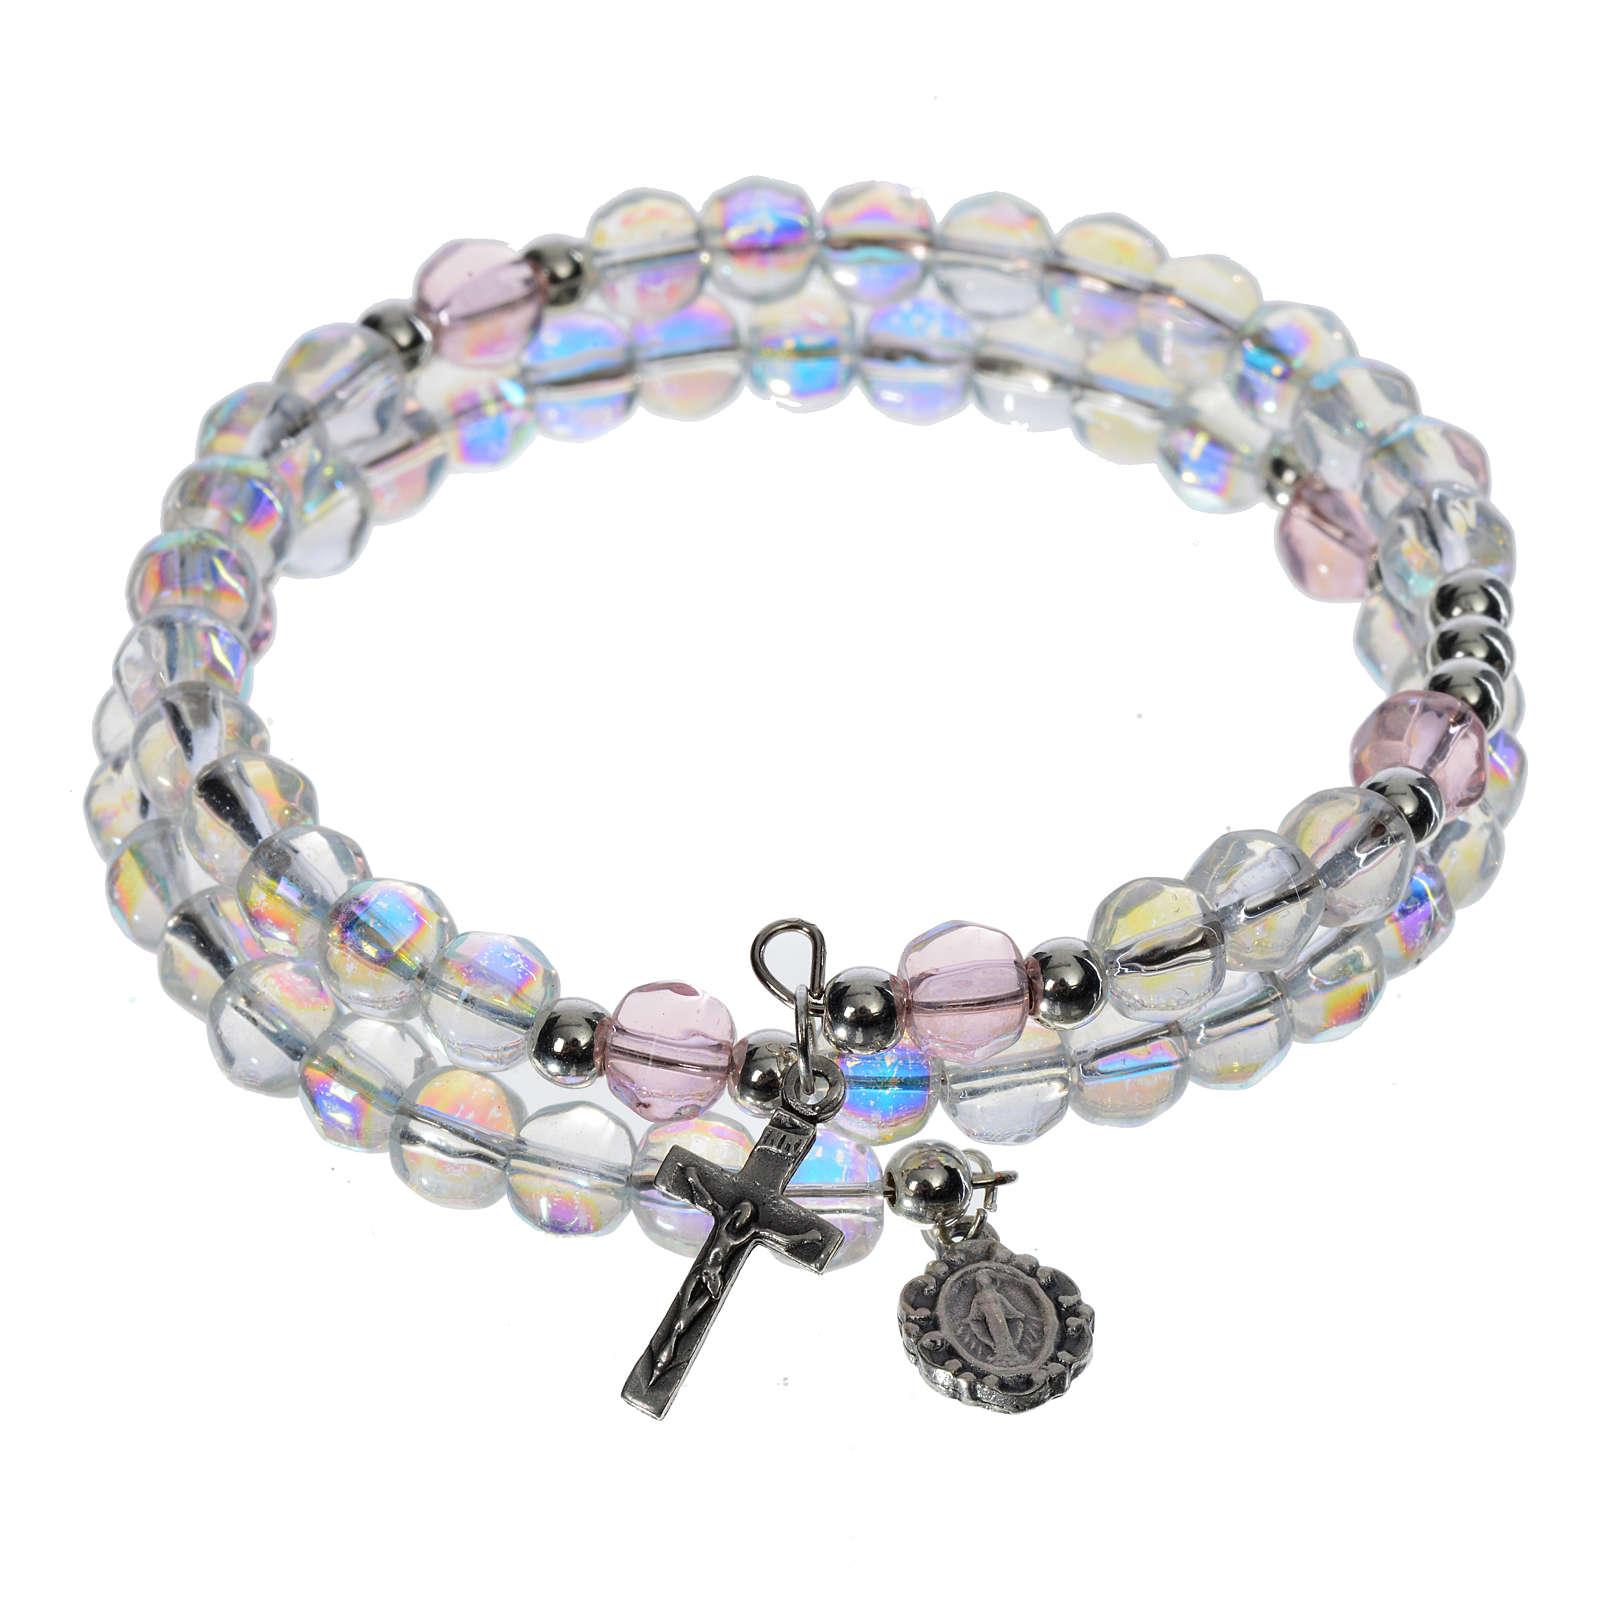 Cristal spring rosary bracelet 4